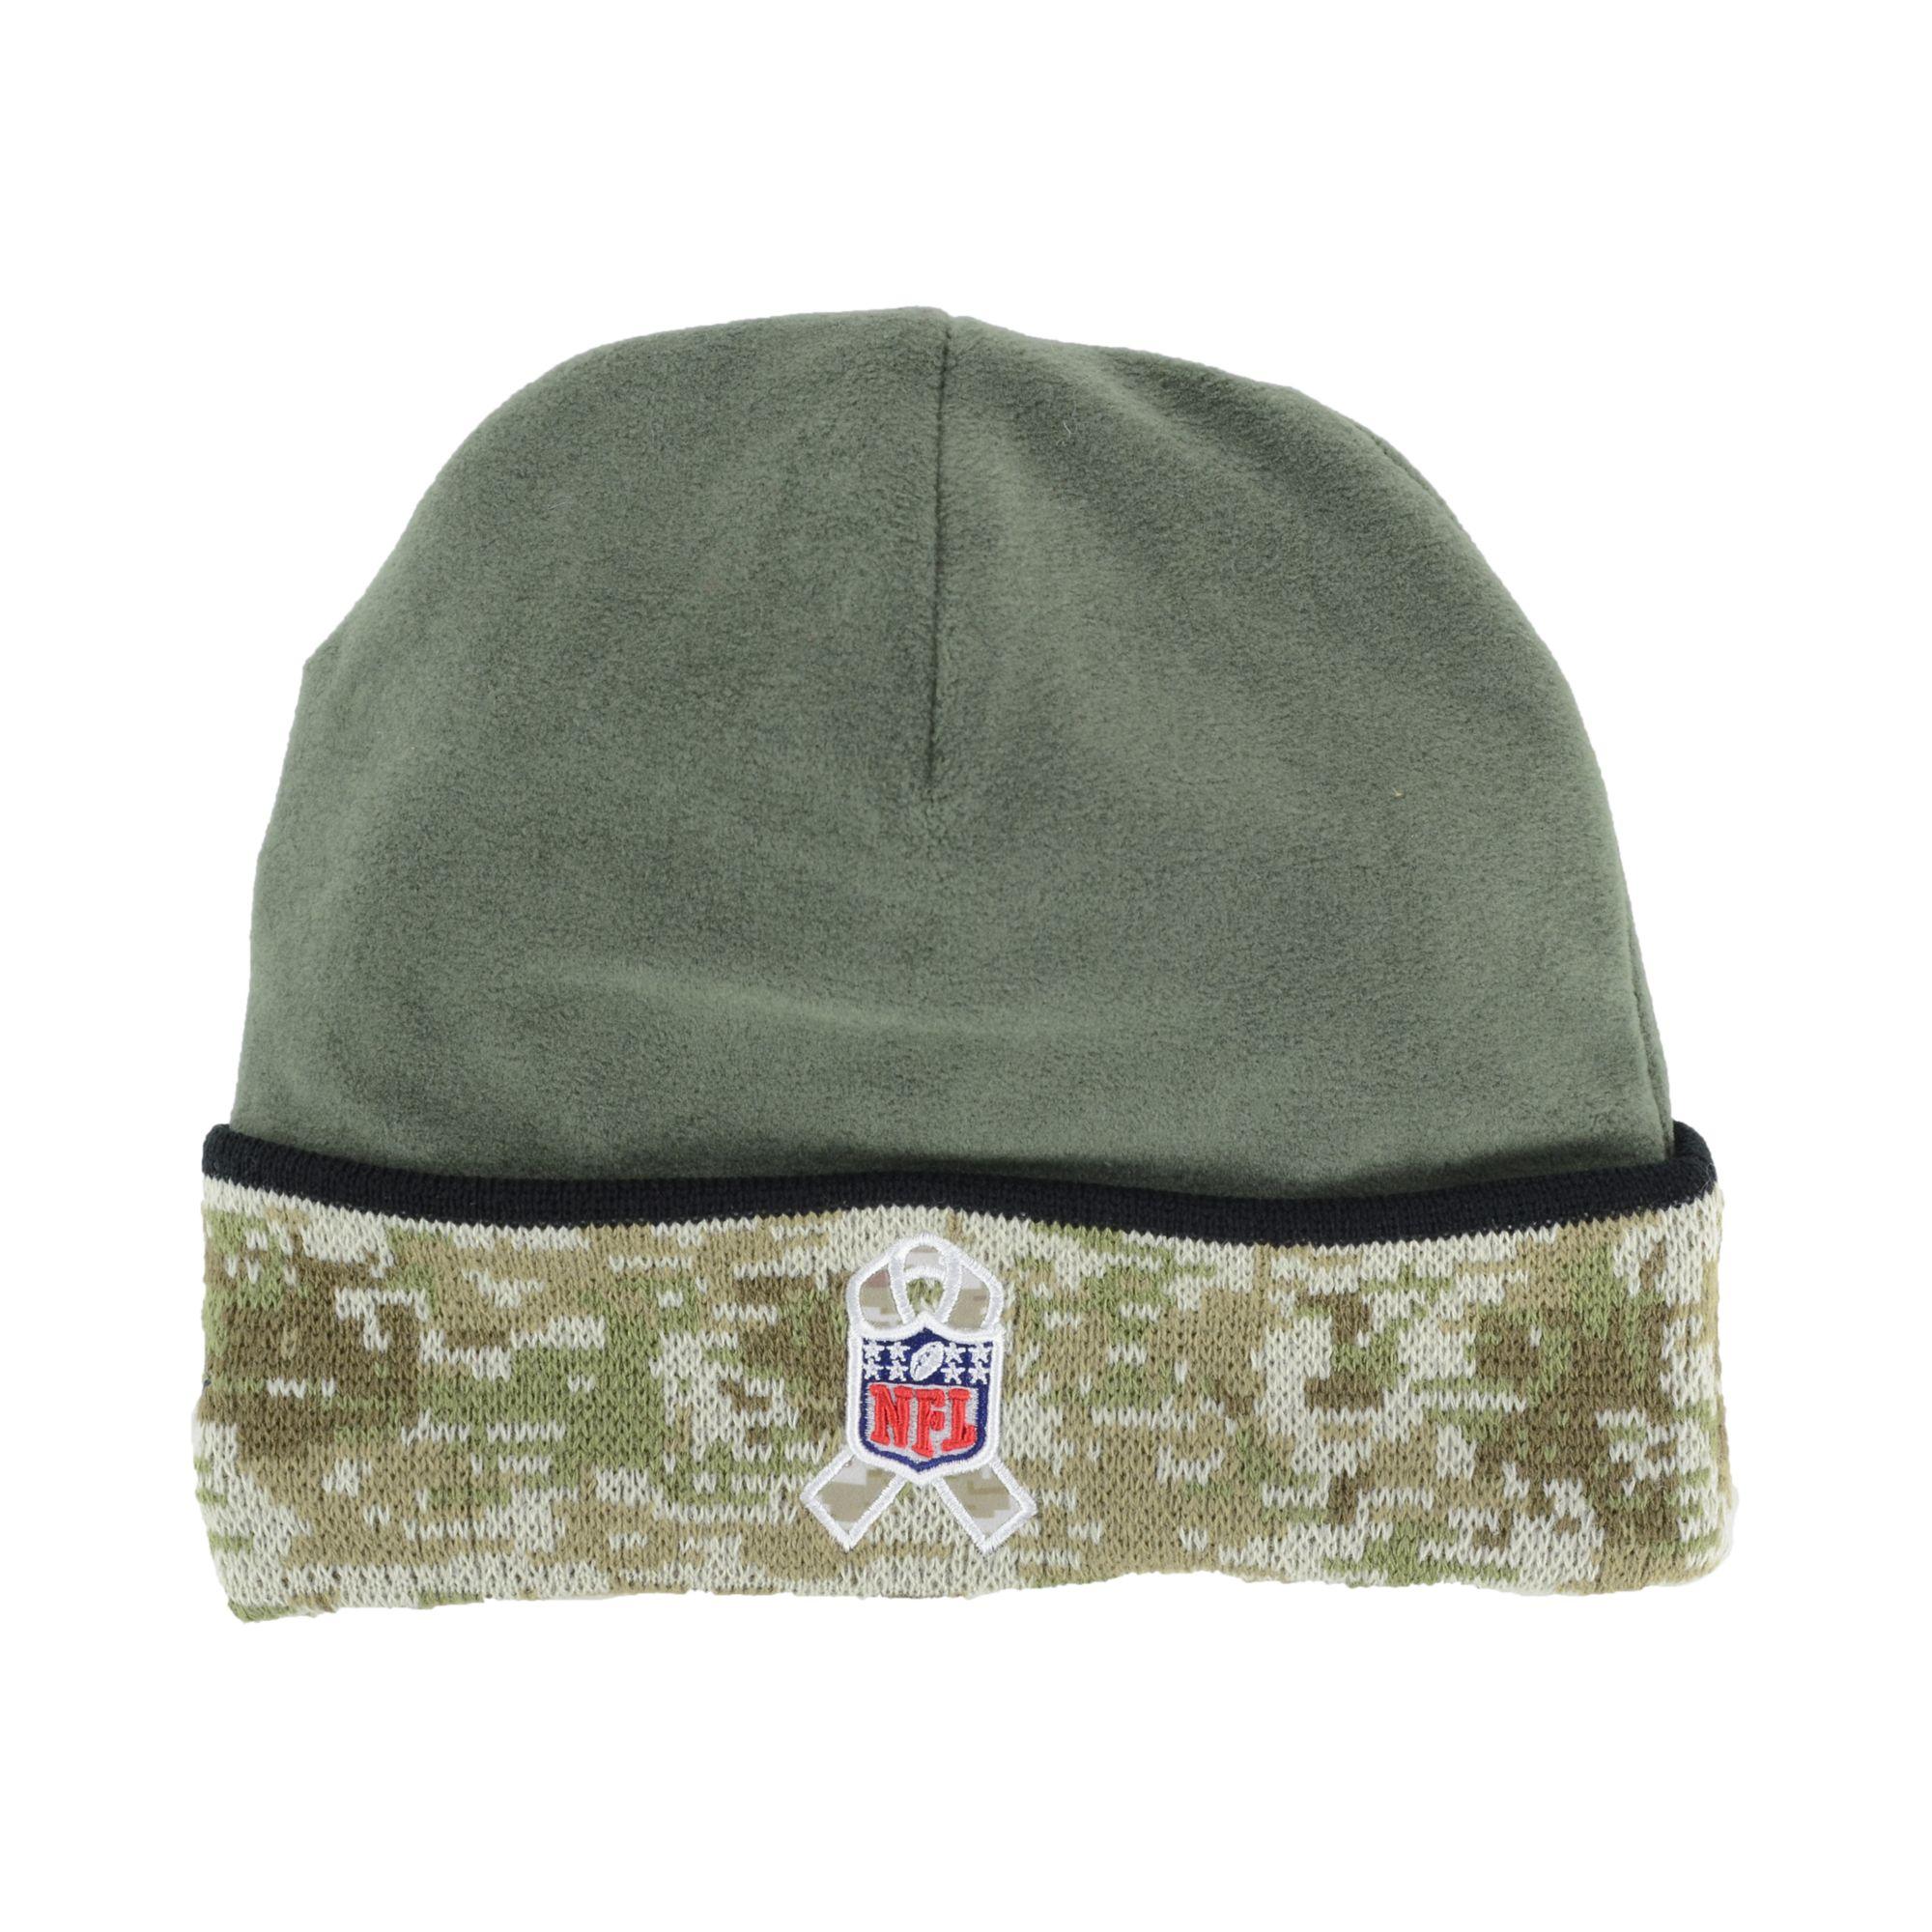 Lyst - KTZ New Orleans Saints Salute To Service Knit Hat in Green ... 6de854e36